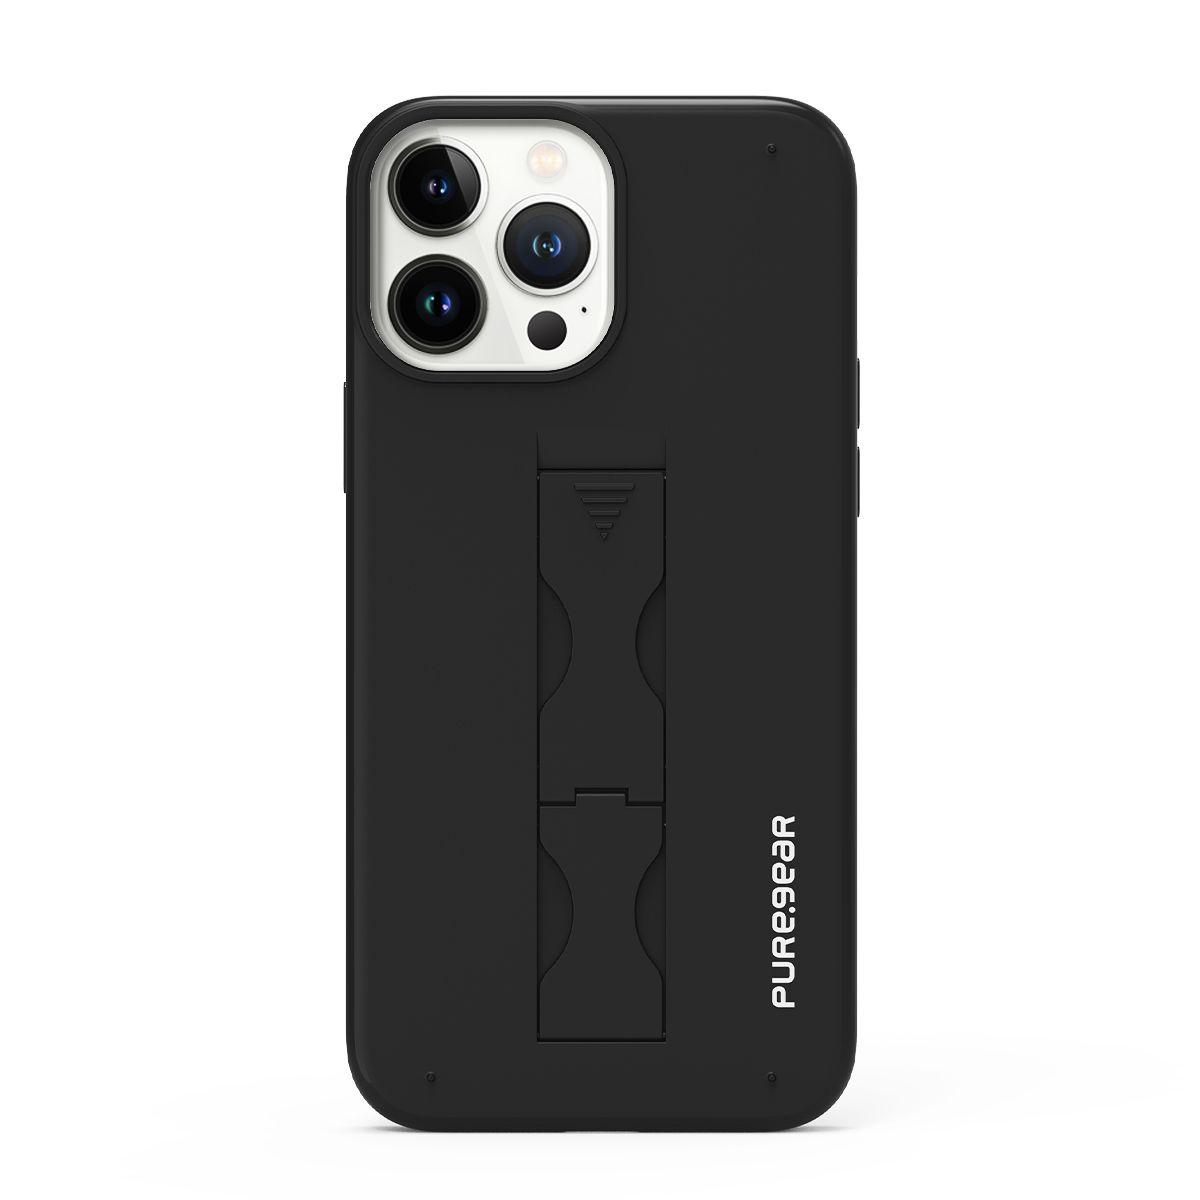 Apple iPhone 13 Pro Max SlimStik, Antimicrobial Kickstand Case – Nightfall